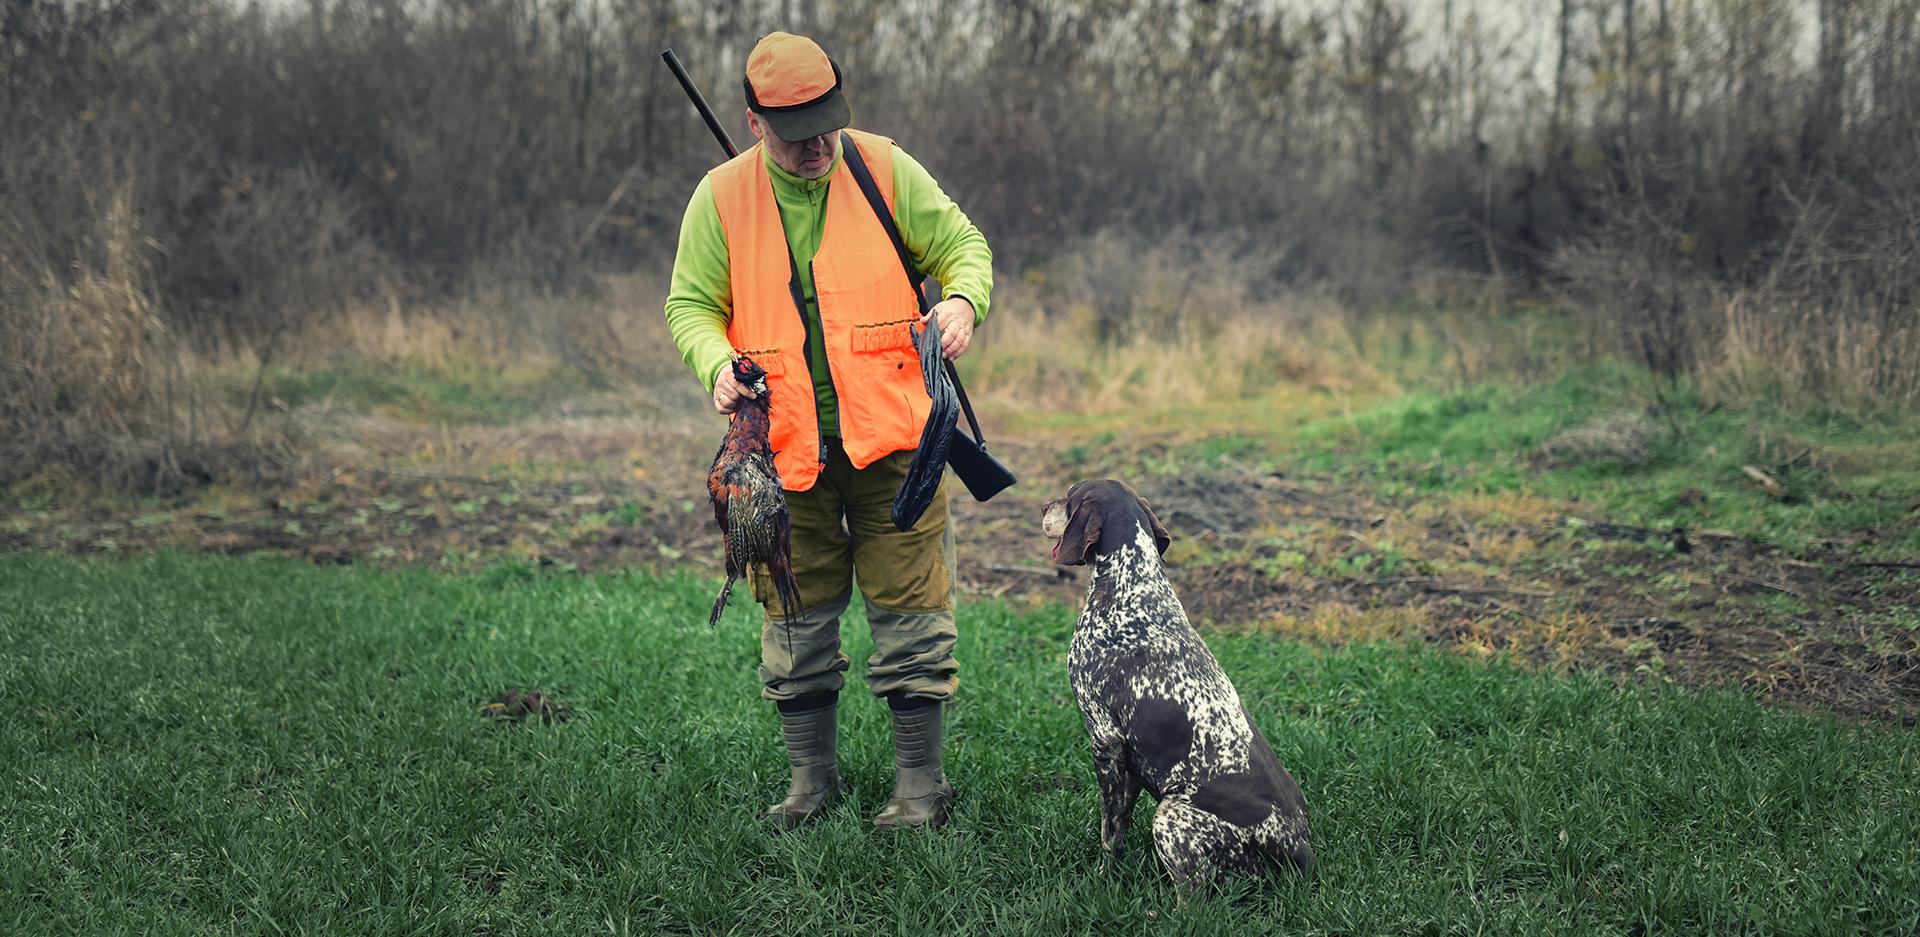 Hunting dog collars, GPS dog collars, vest | Spyboar